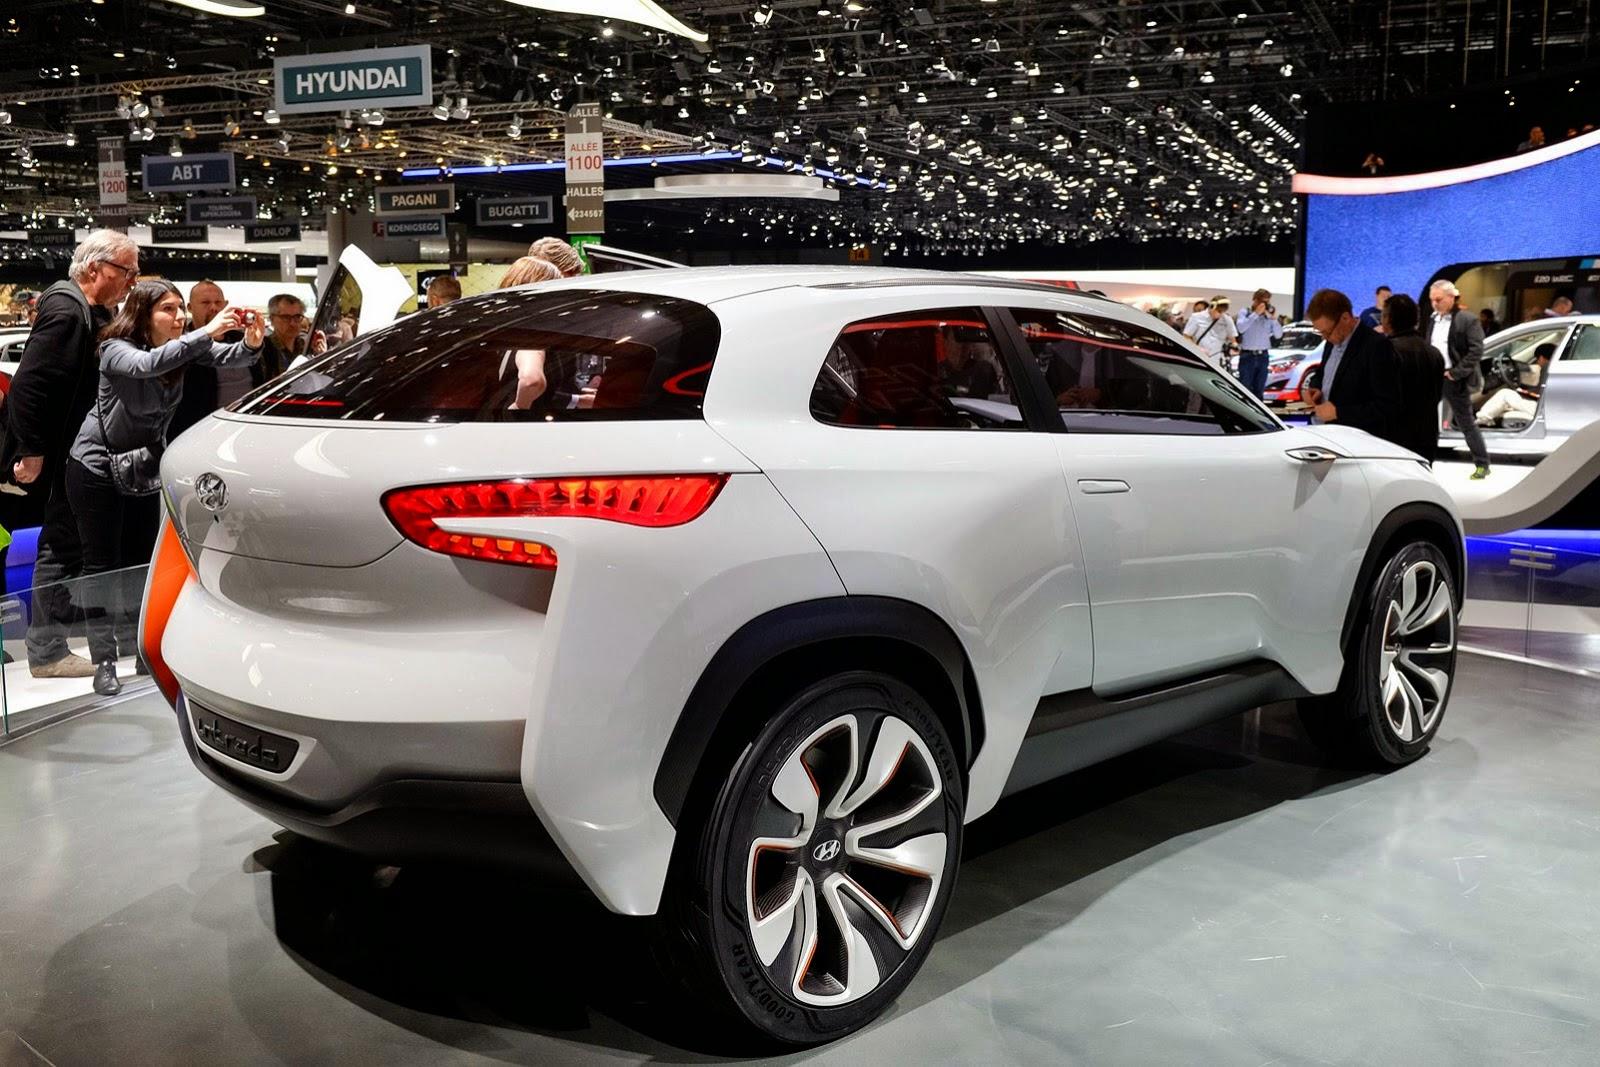 Hyundai เตรียมเปิดตัวรถ Suv แบบใหม่ท้าชน Quot Nissan Juke